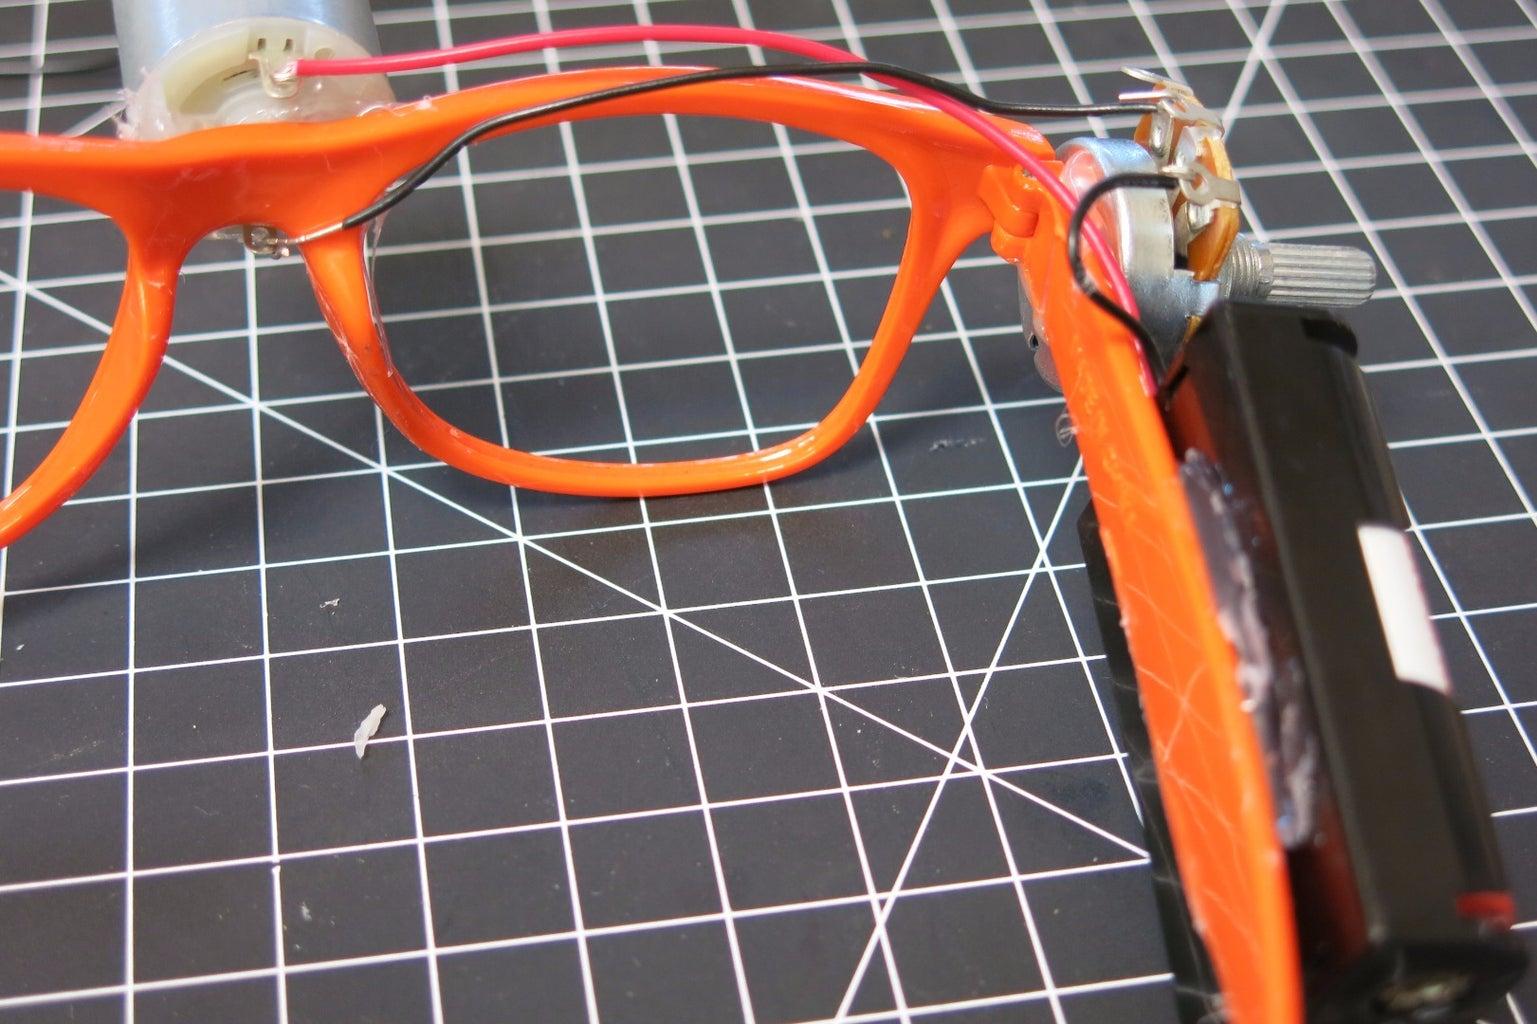 Wire Up!